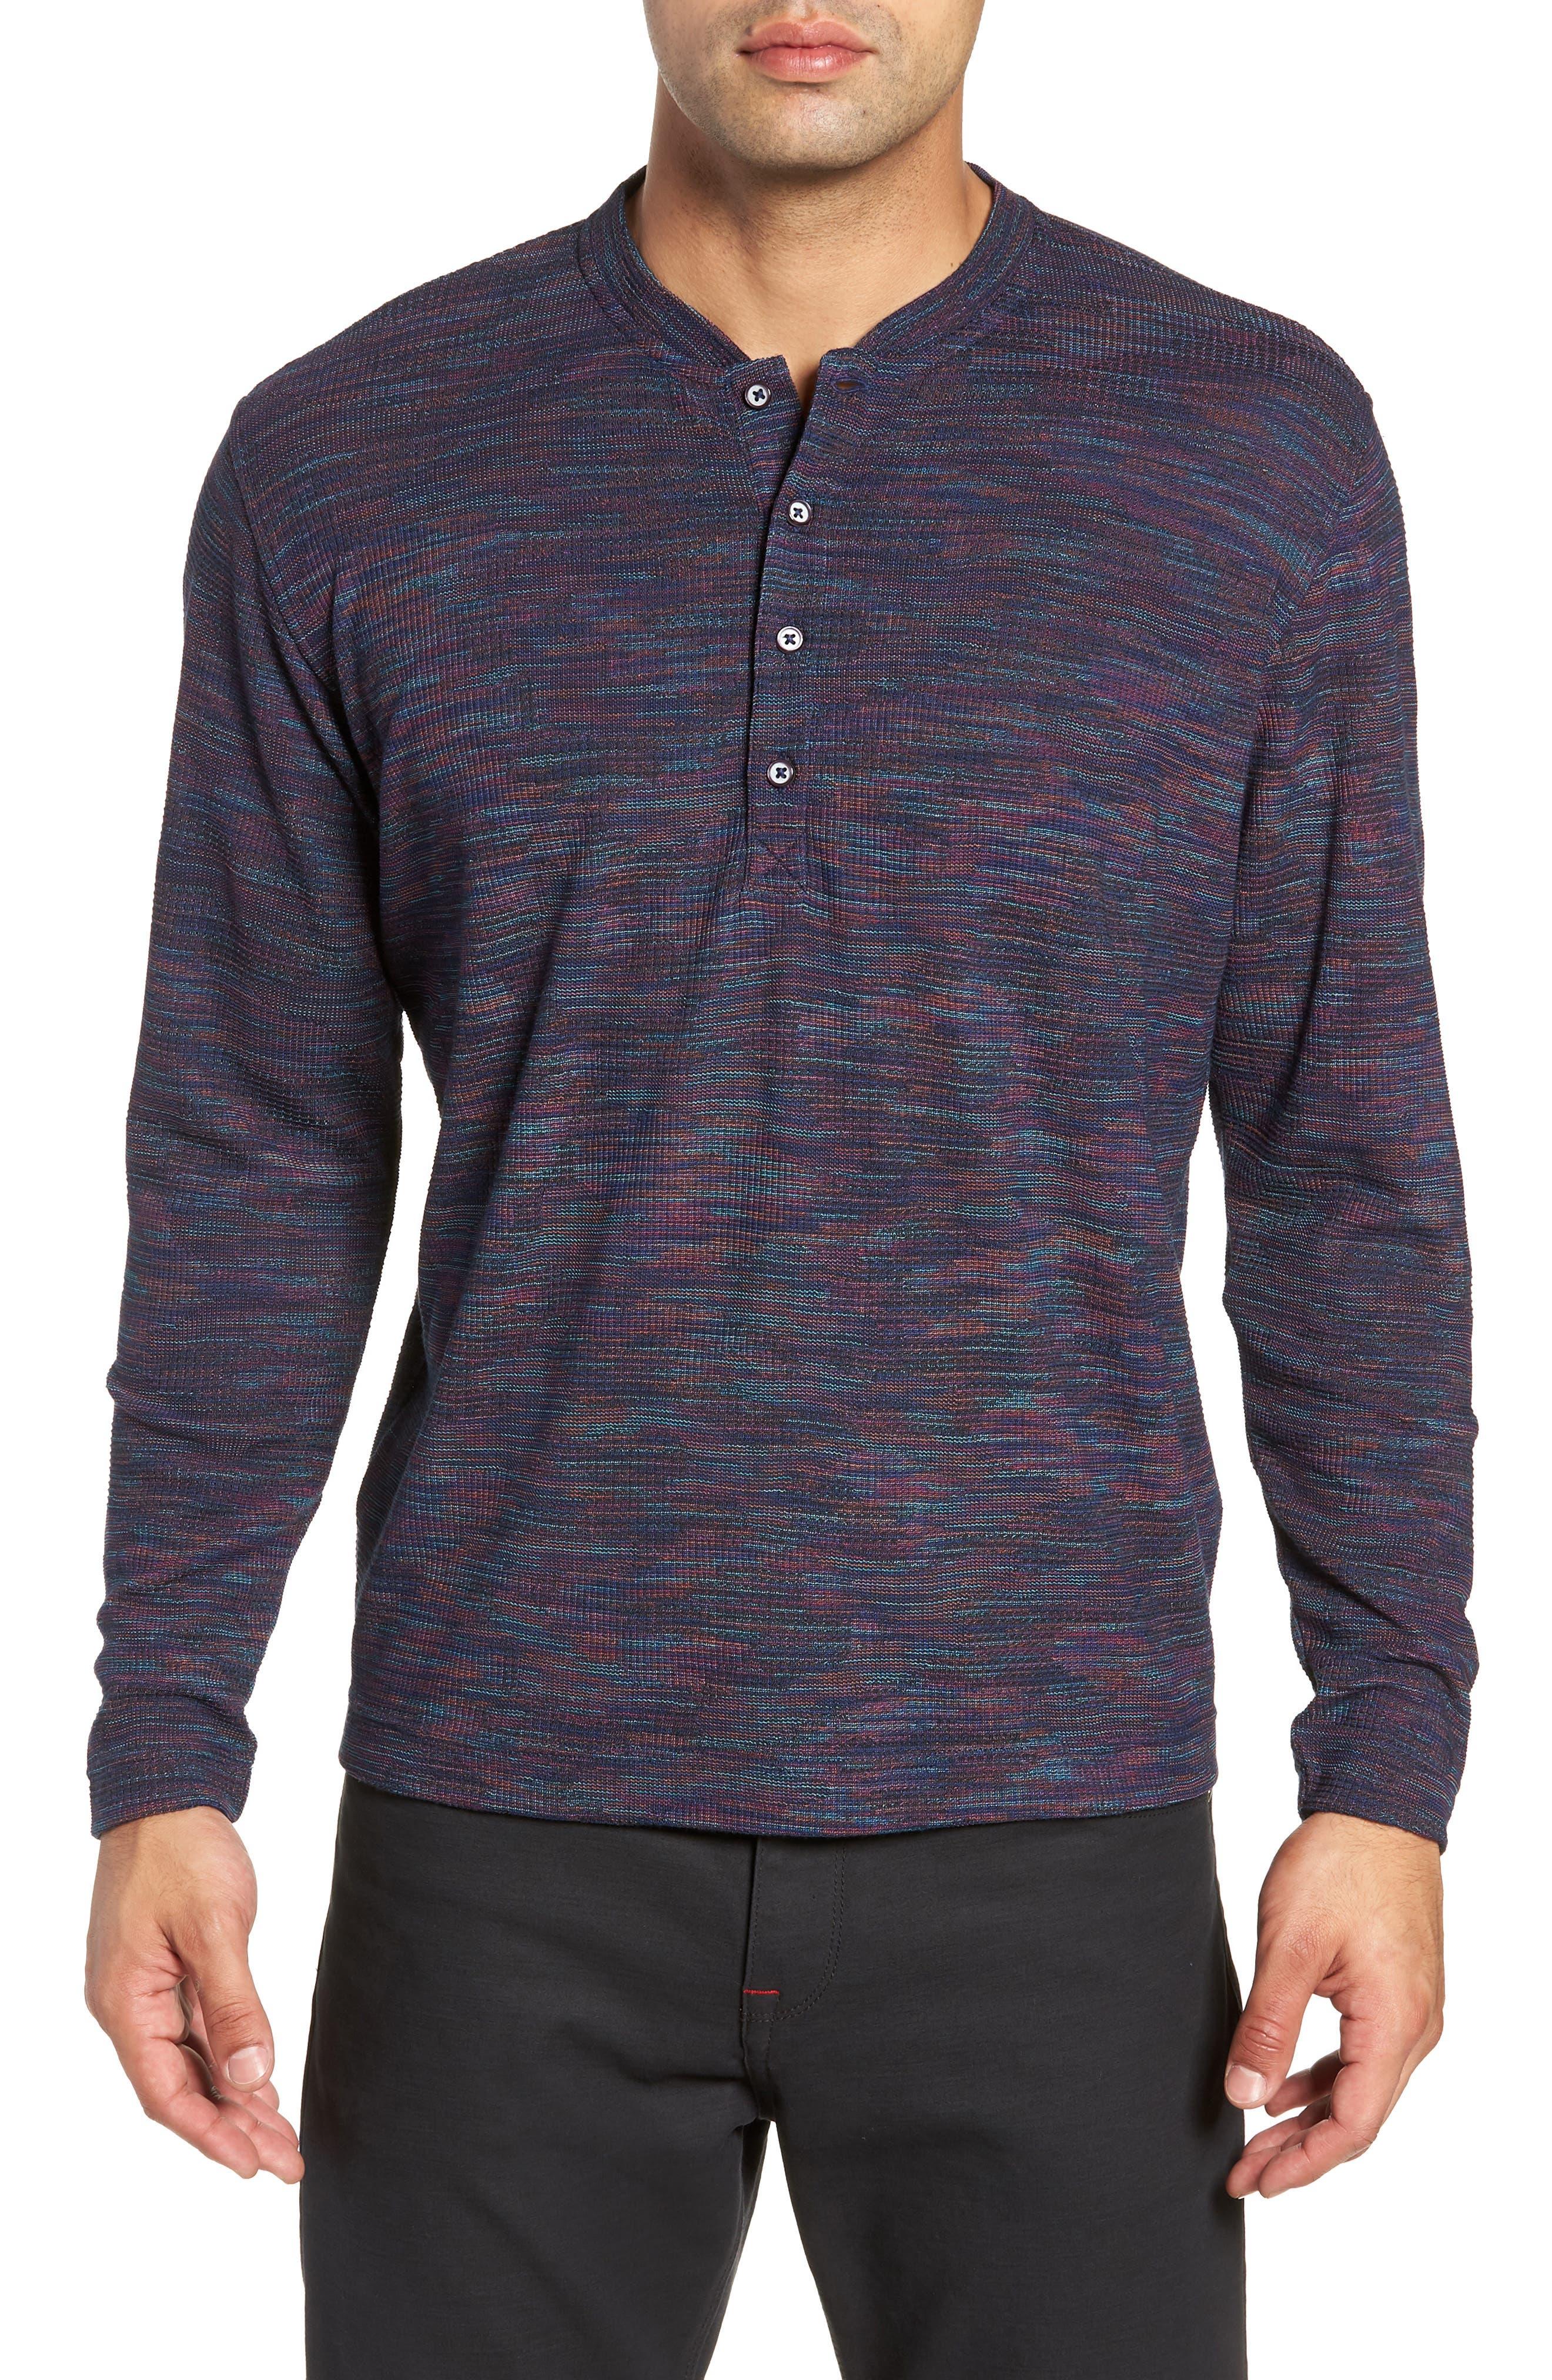 Forster Long Sleeve Henley Shirt,                             Main thumbnail 1, color,                             NAVY